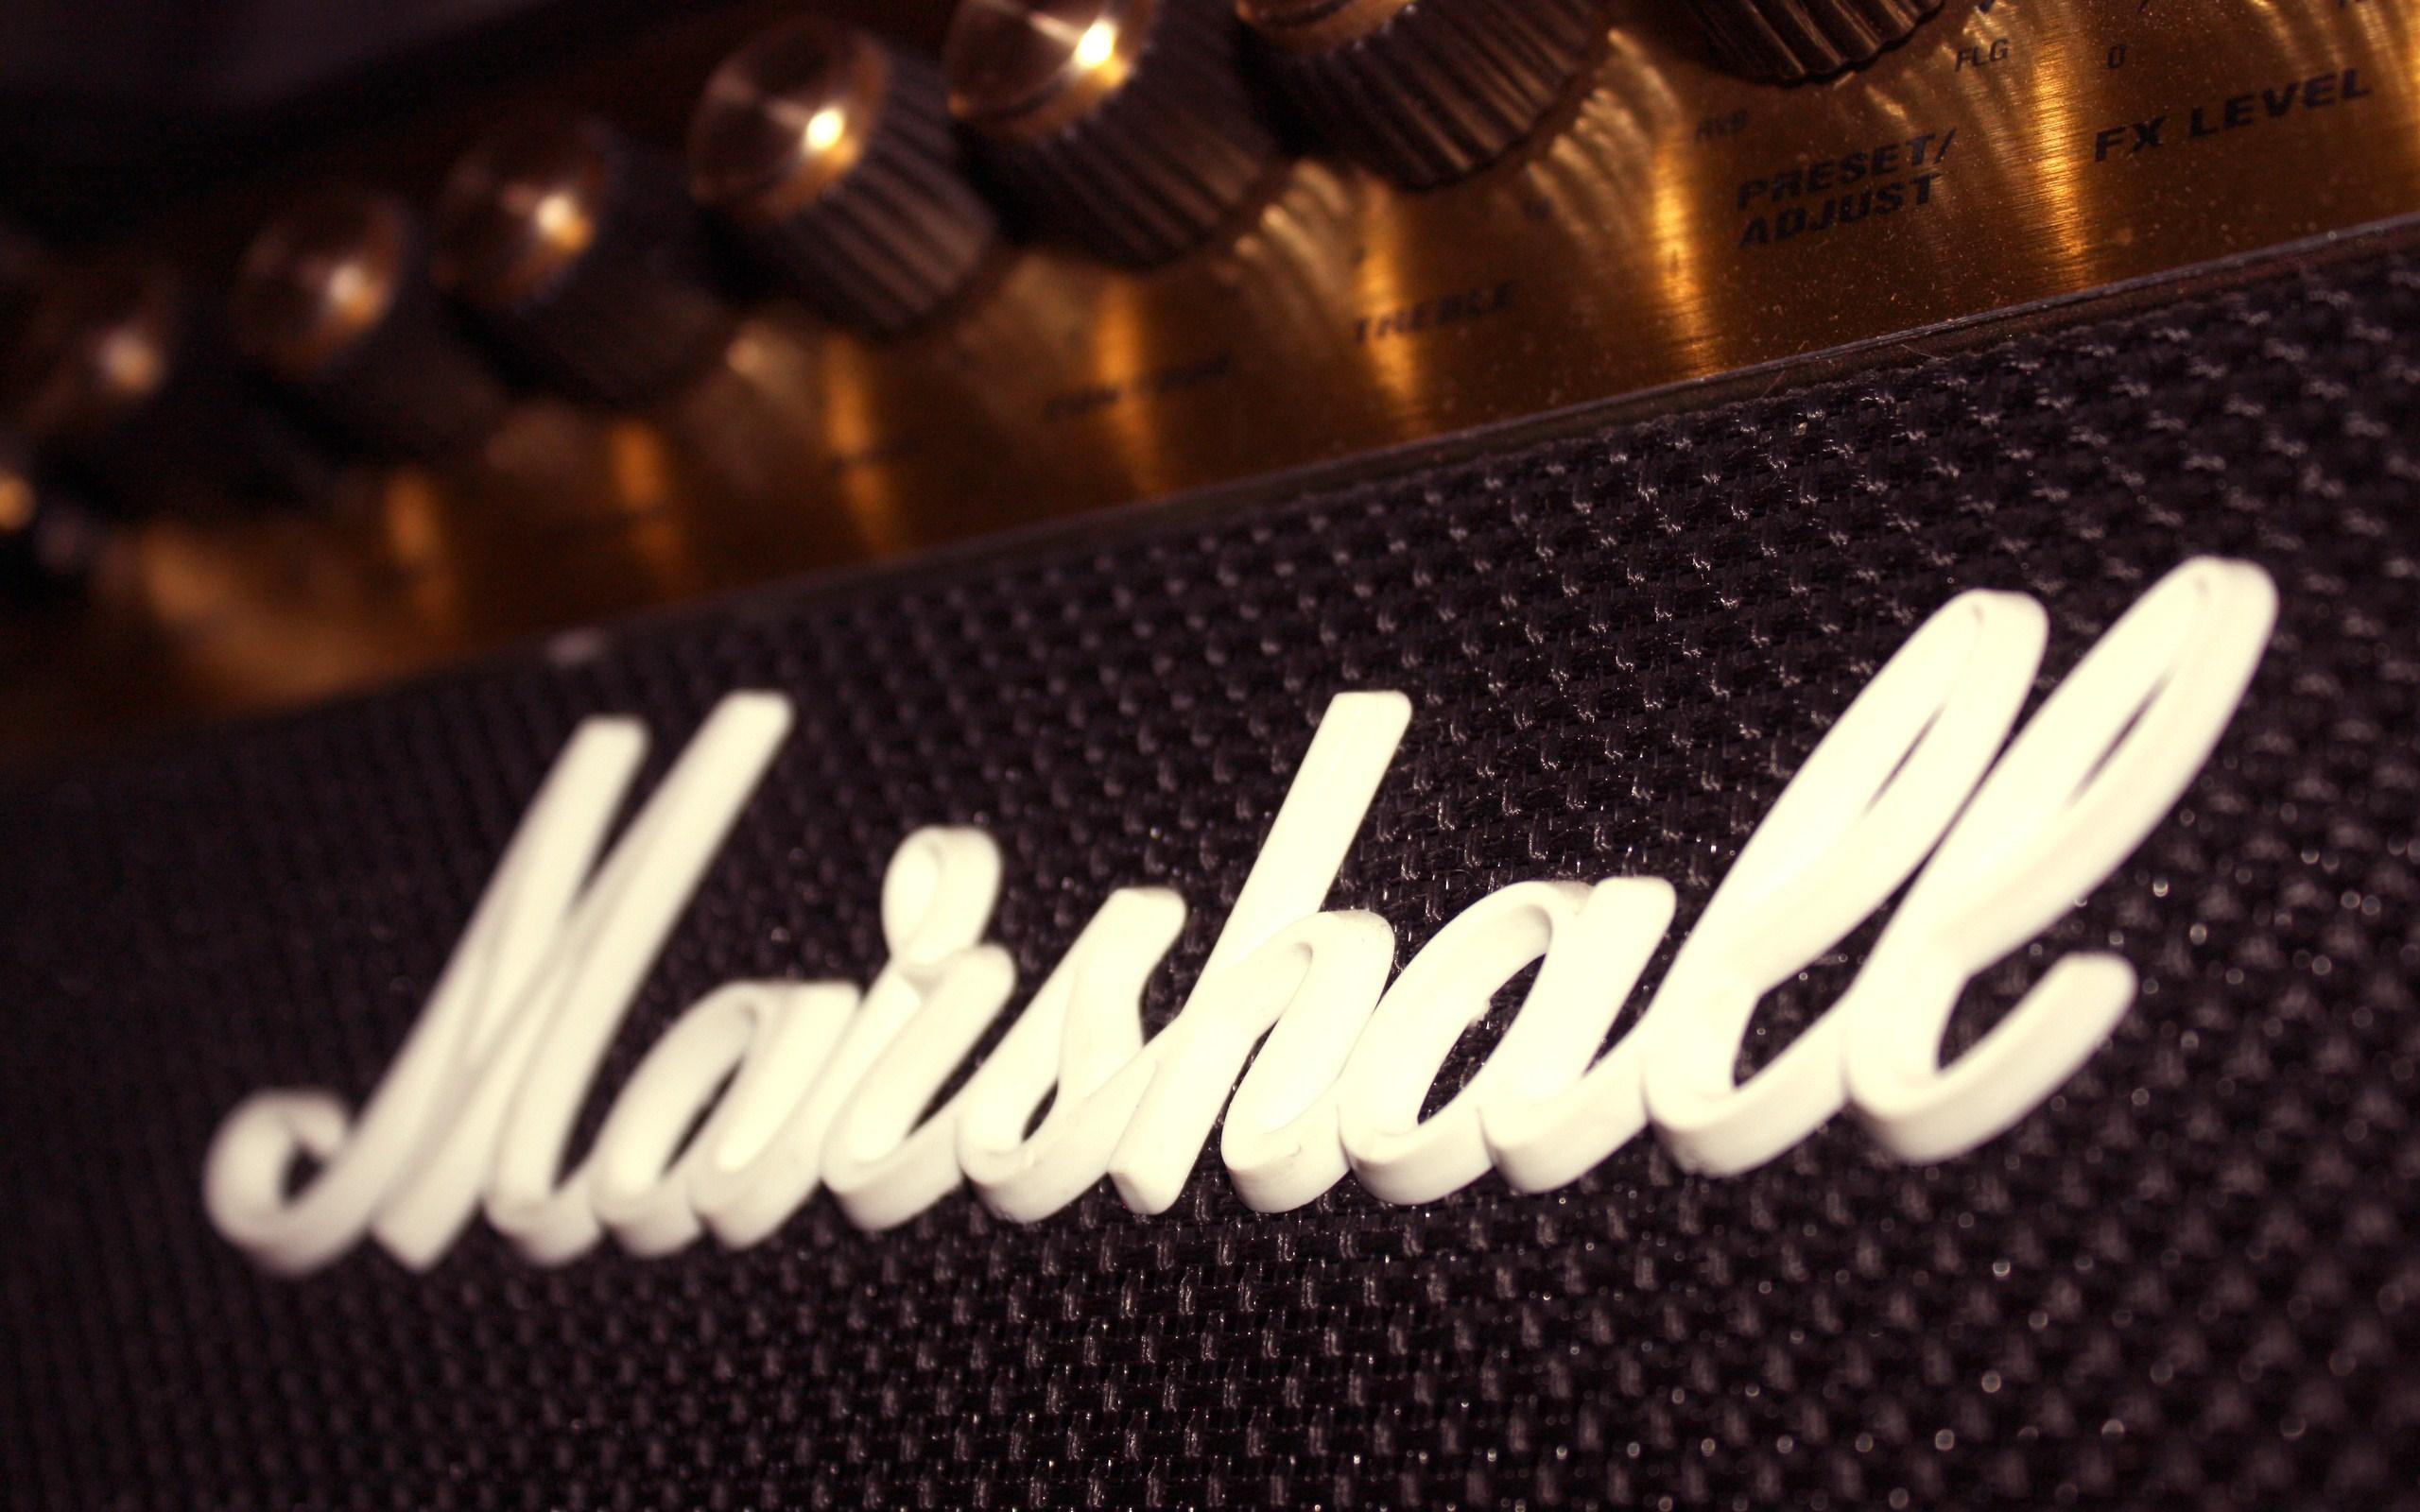 Amplifier Marshall Jcm900 Music